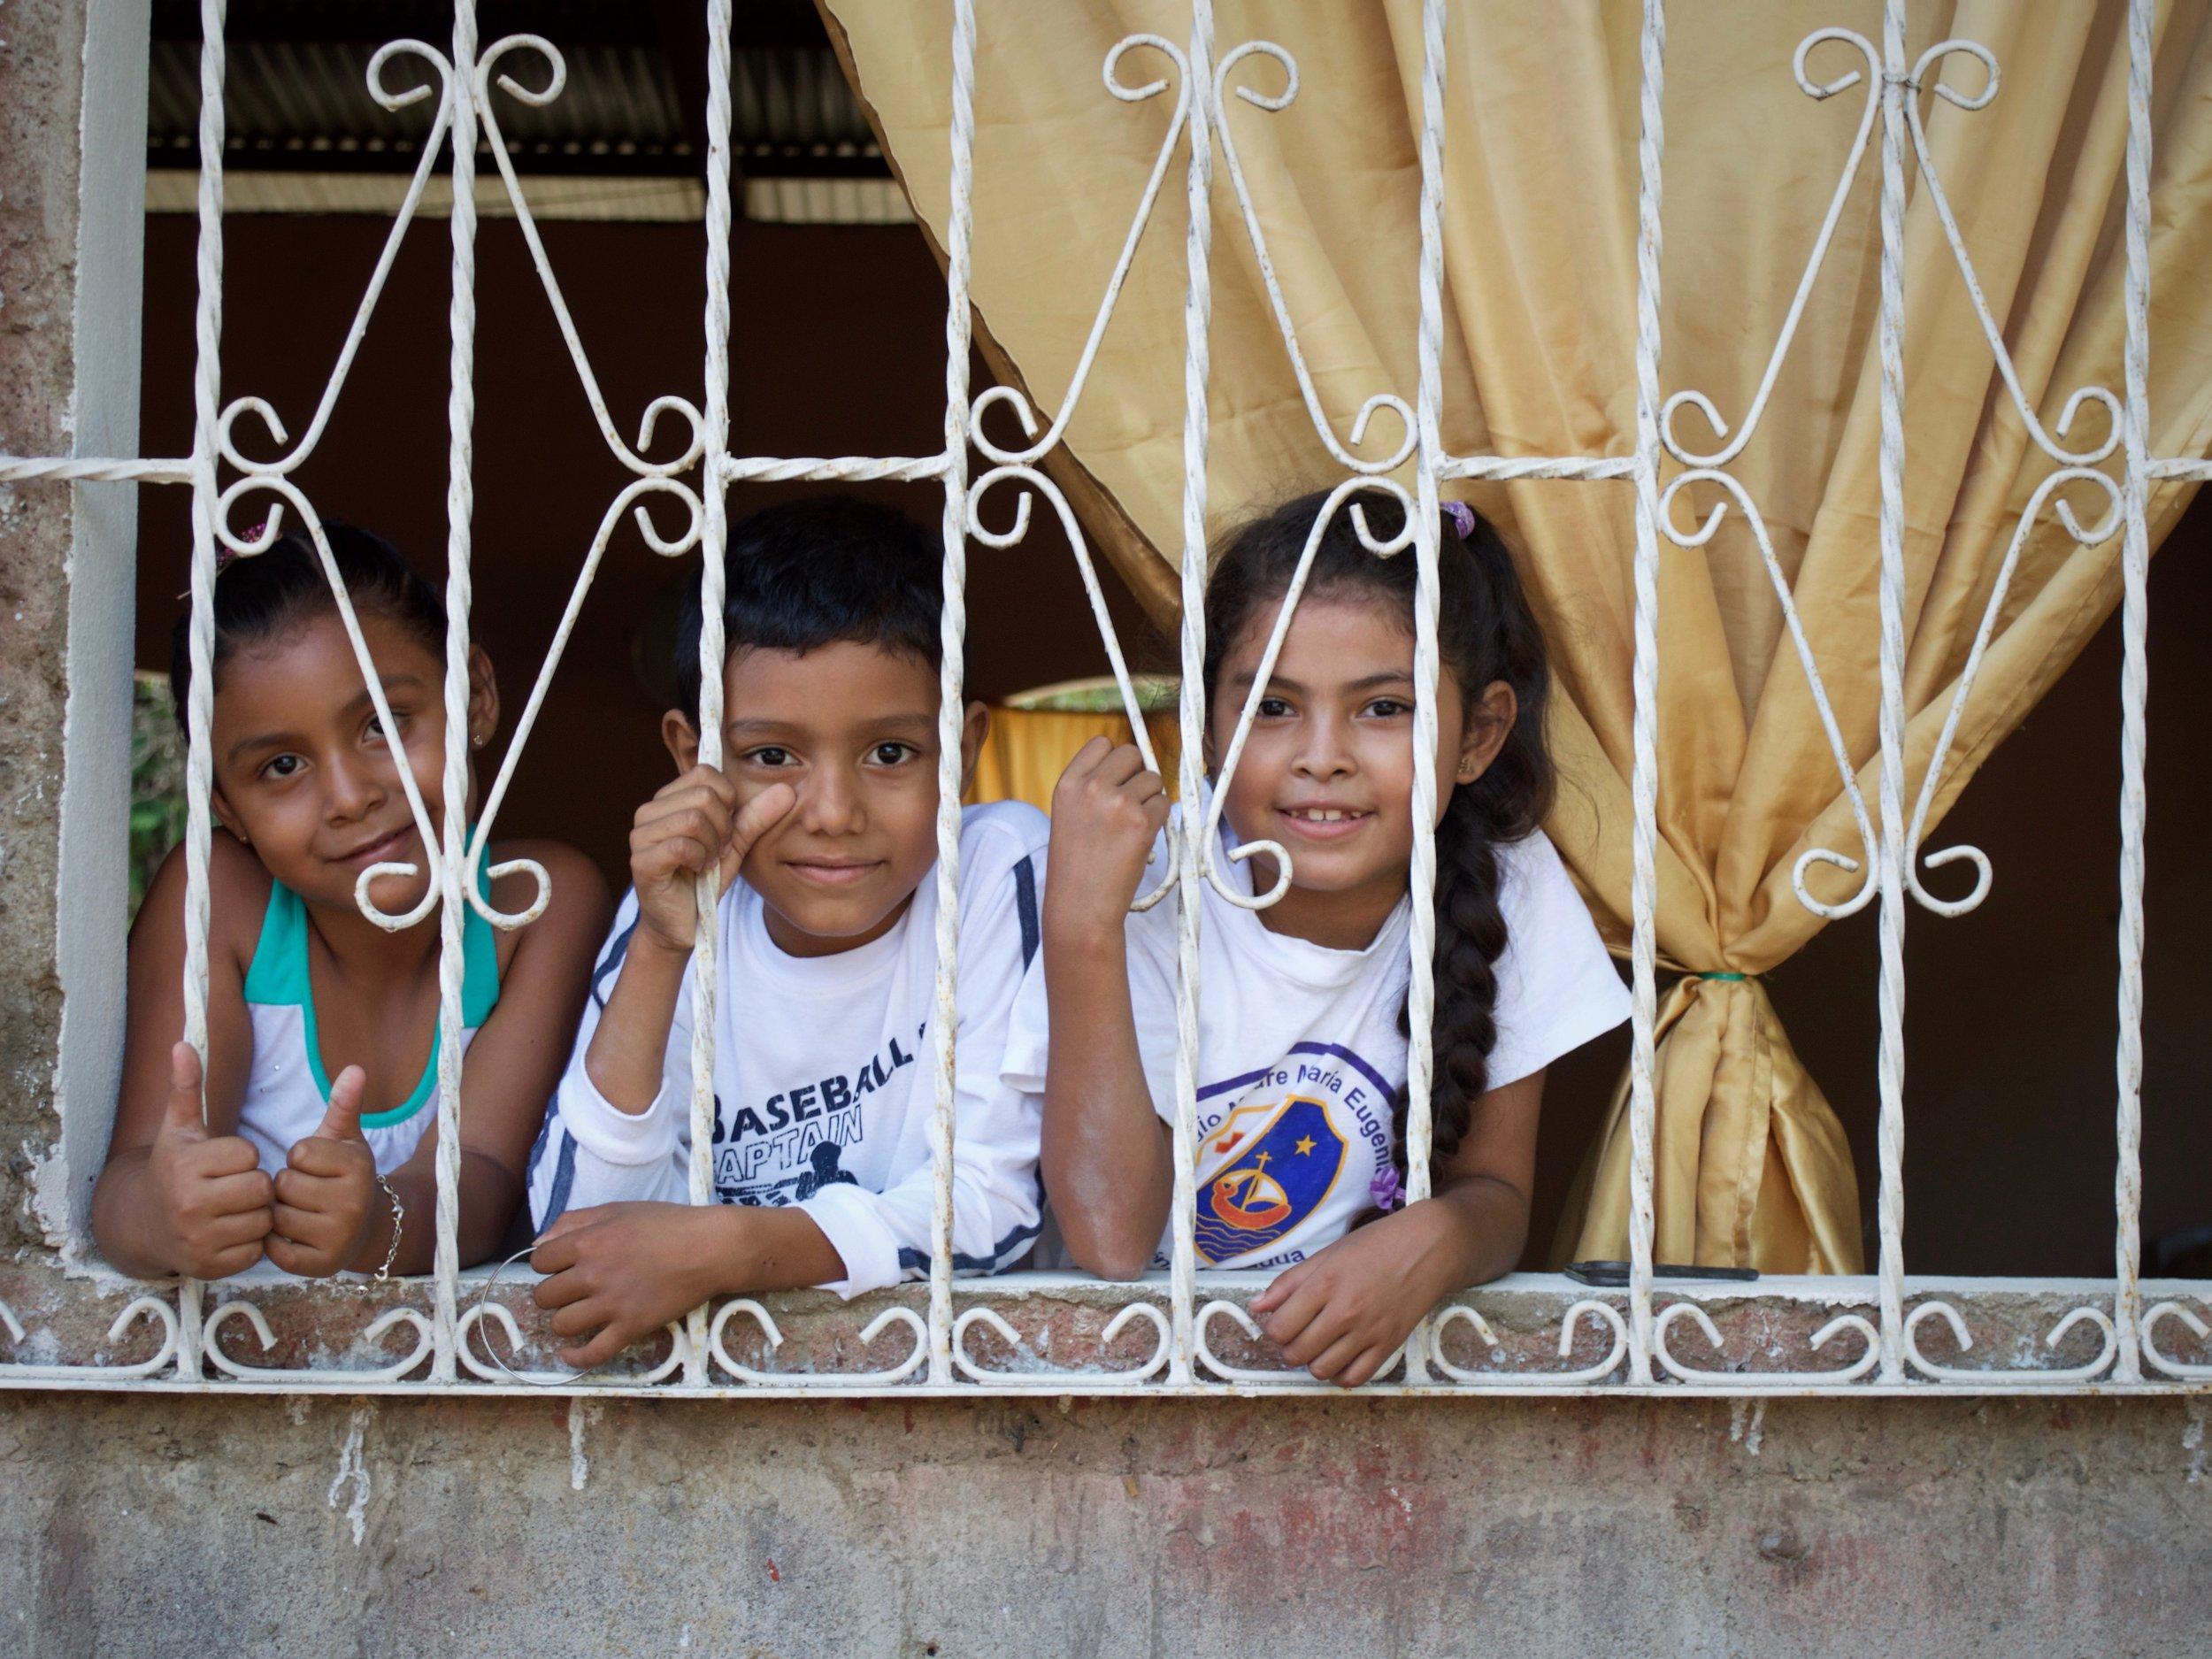 Photo 2 - Kids.jpg